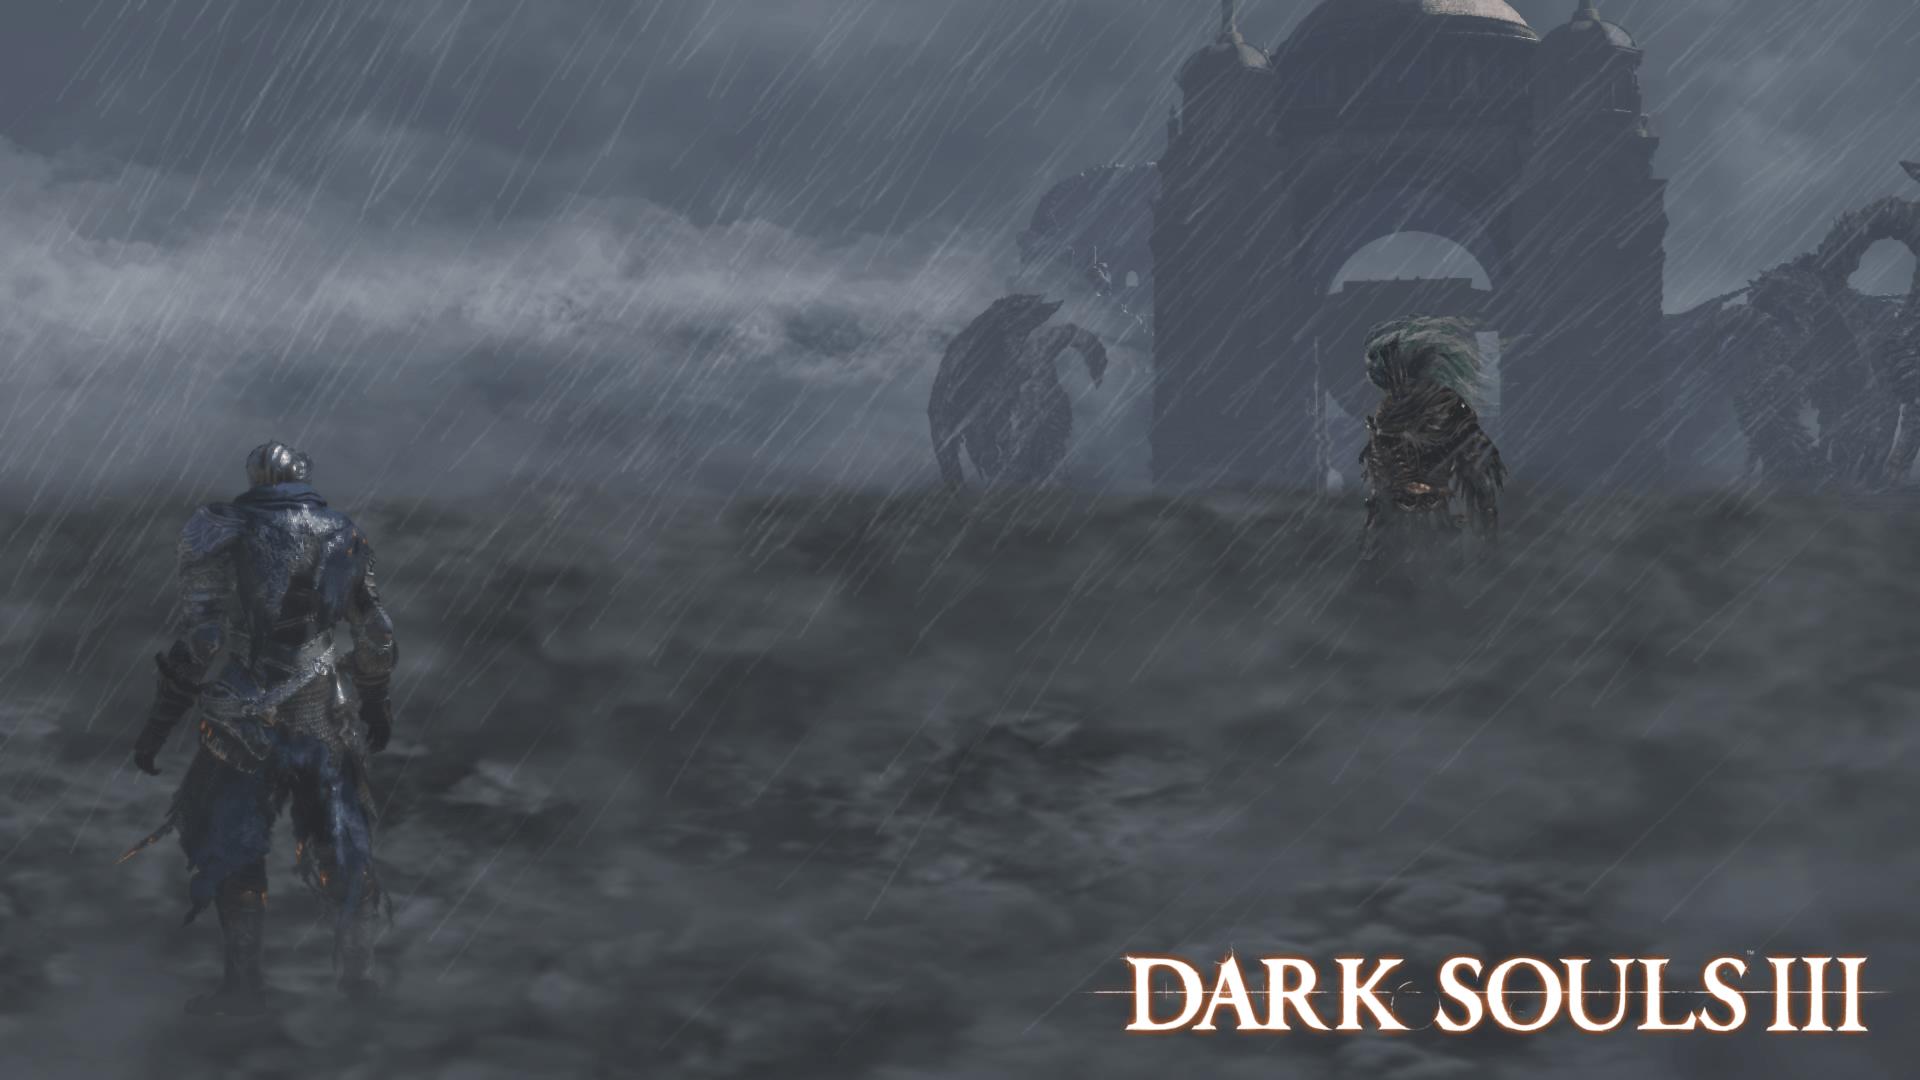 Dark Souls III: Ημερομηνία κυκλοφορίας του πρώτου DLC Wallhaven-367939